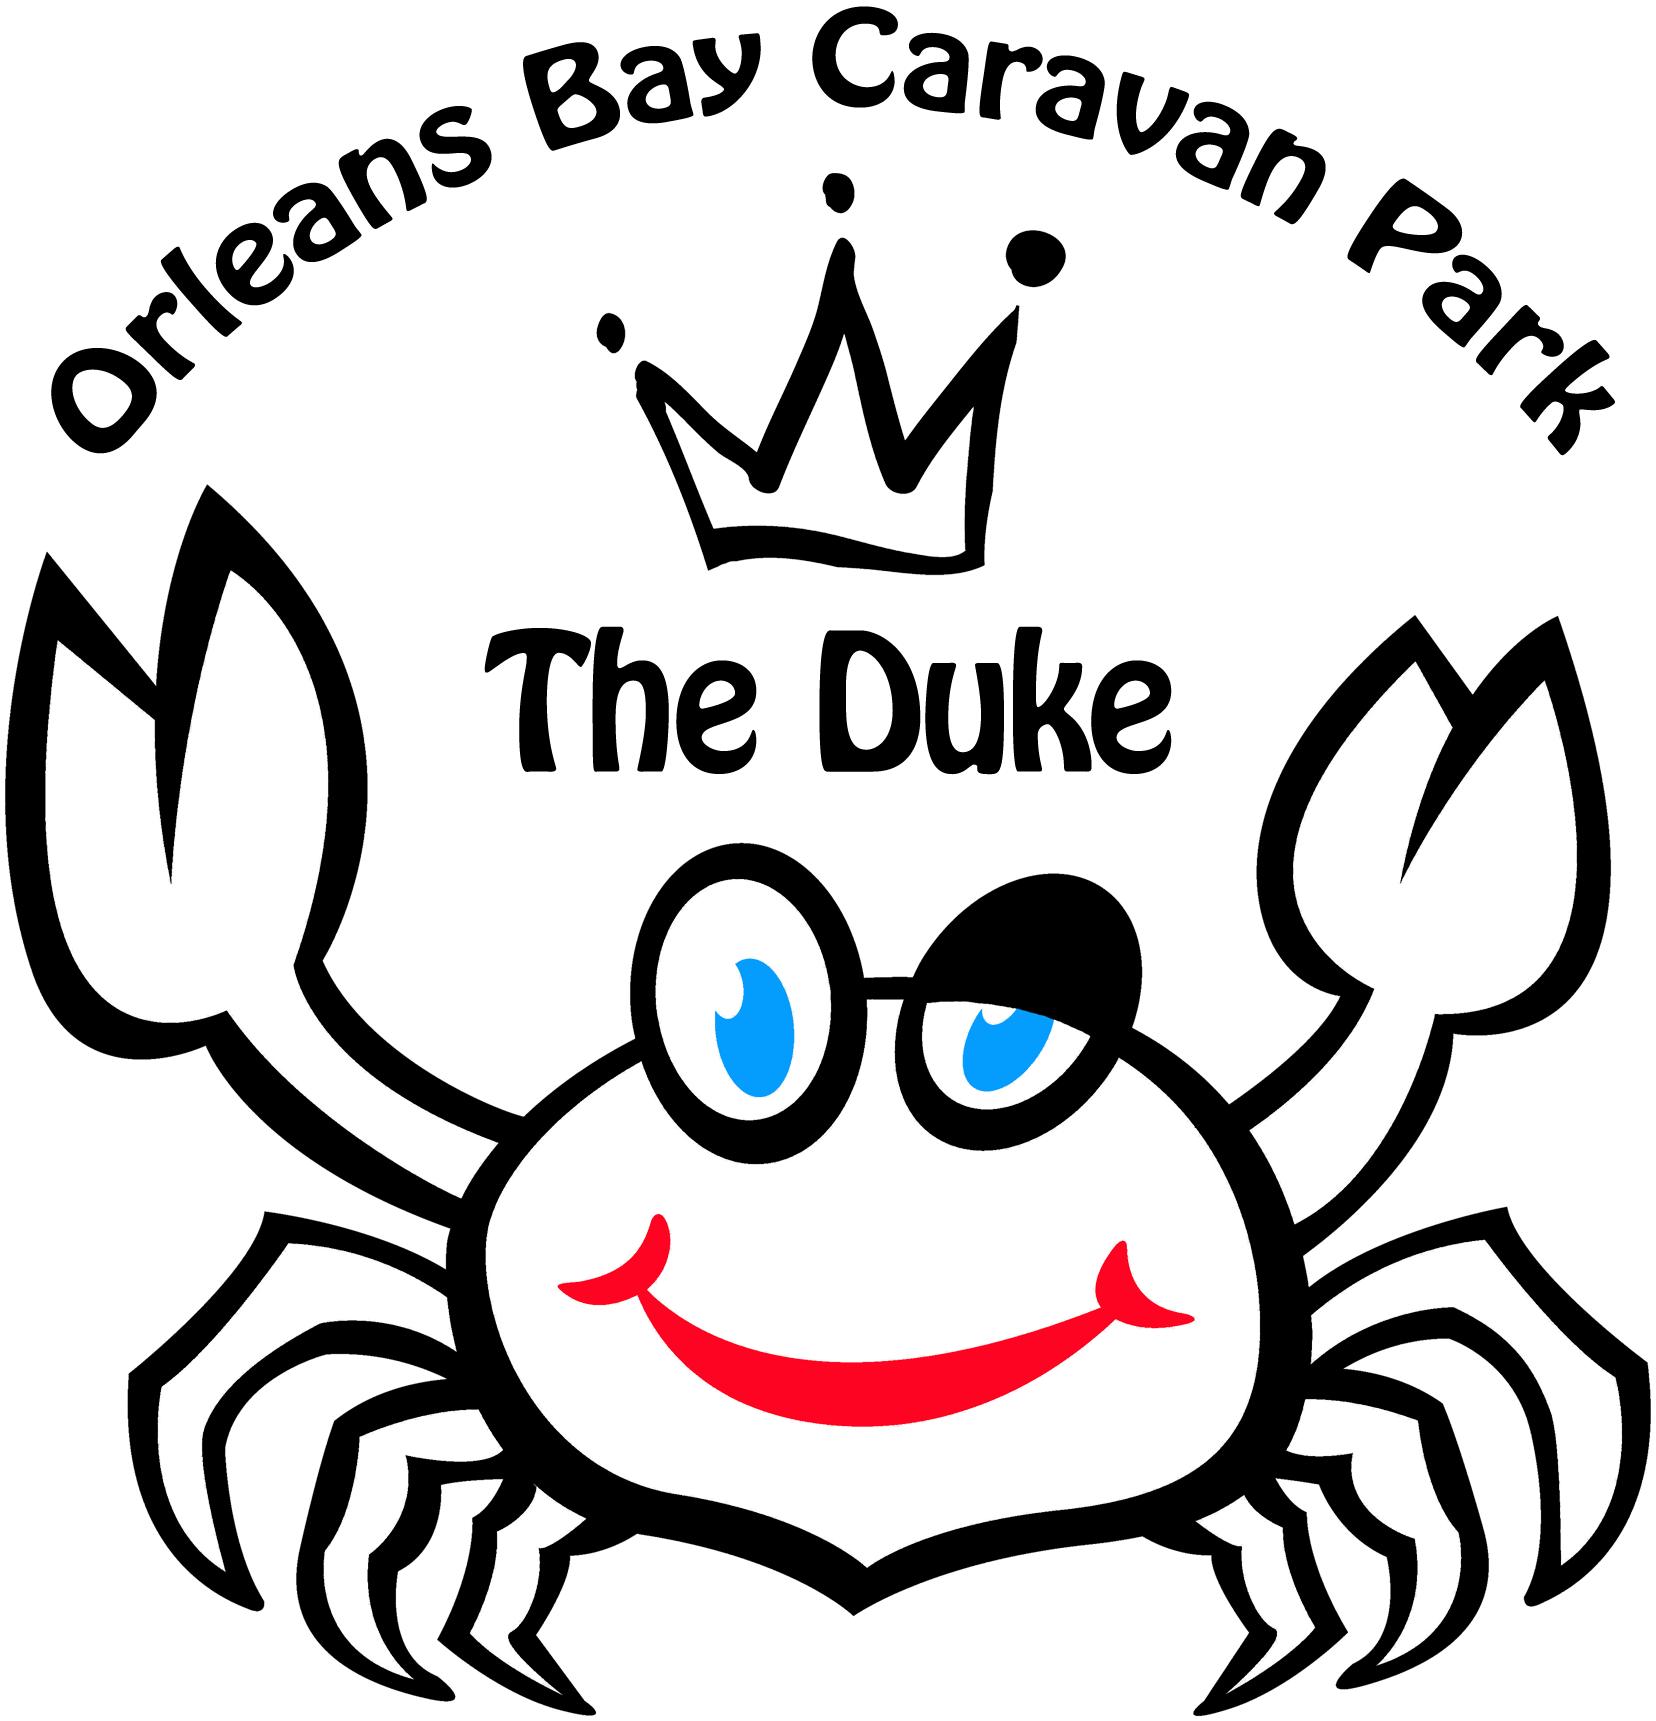 Orleans Bay Caravan Park Logo